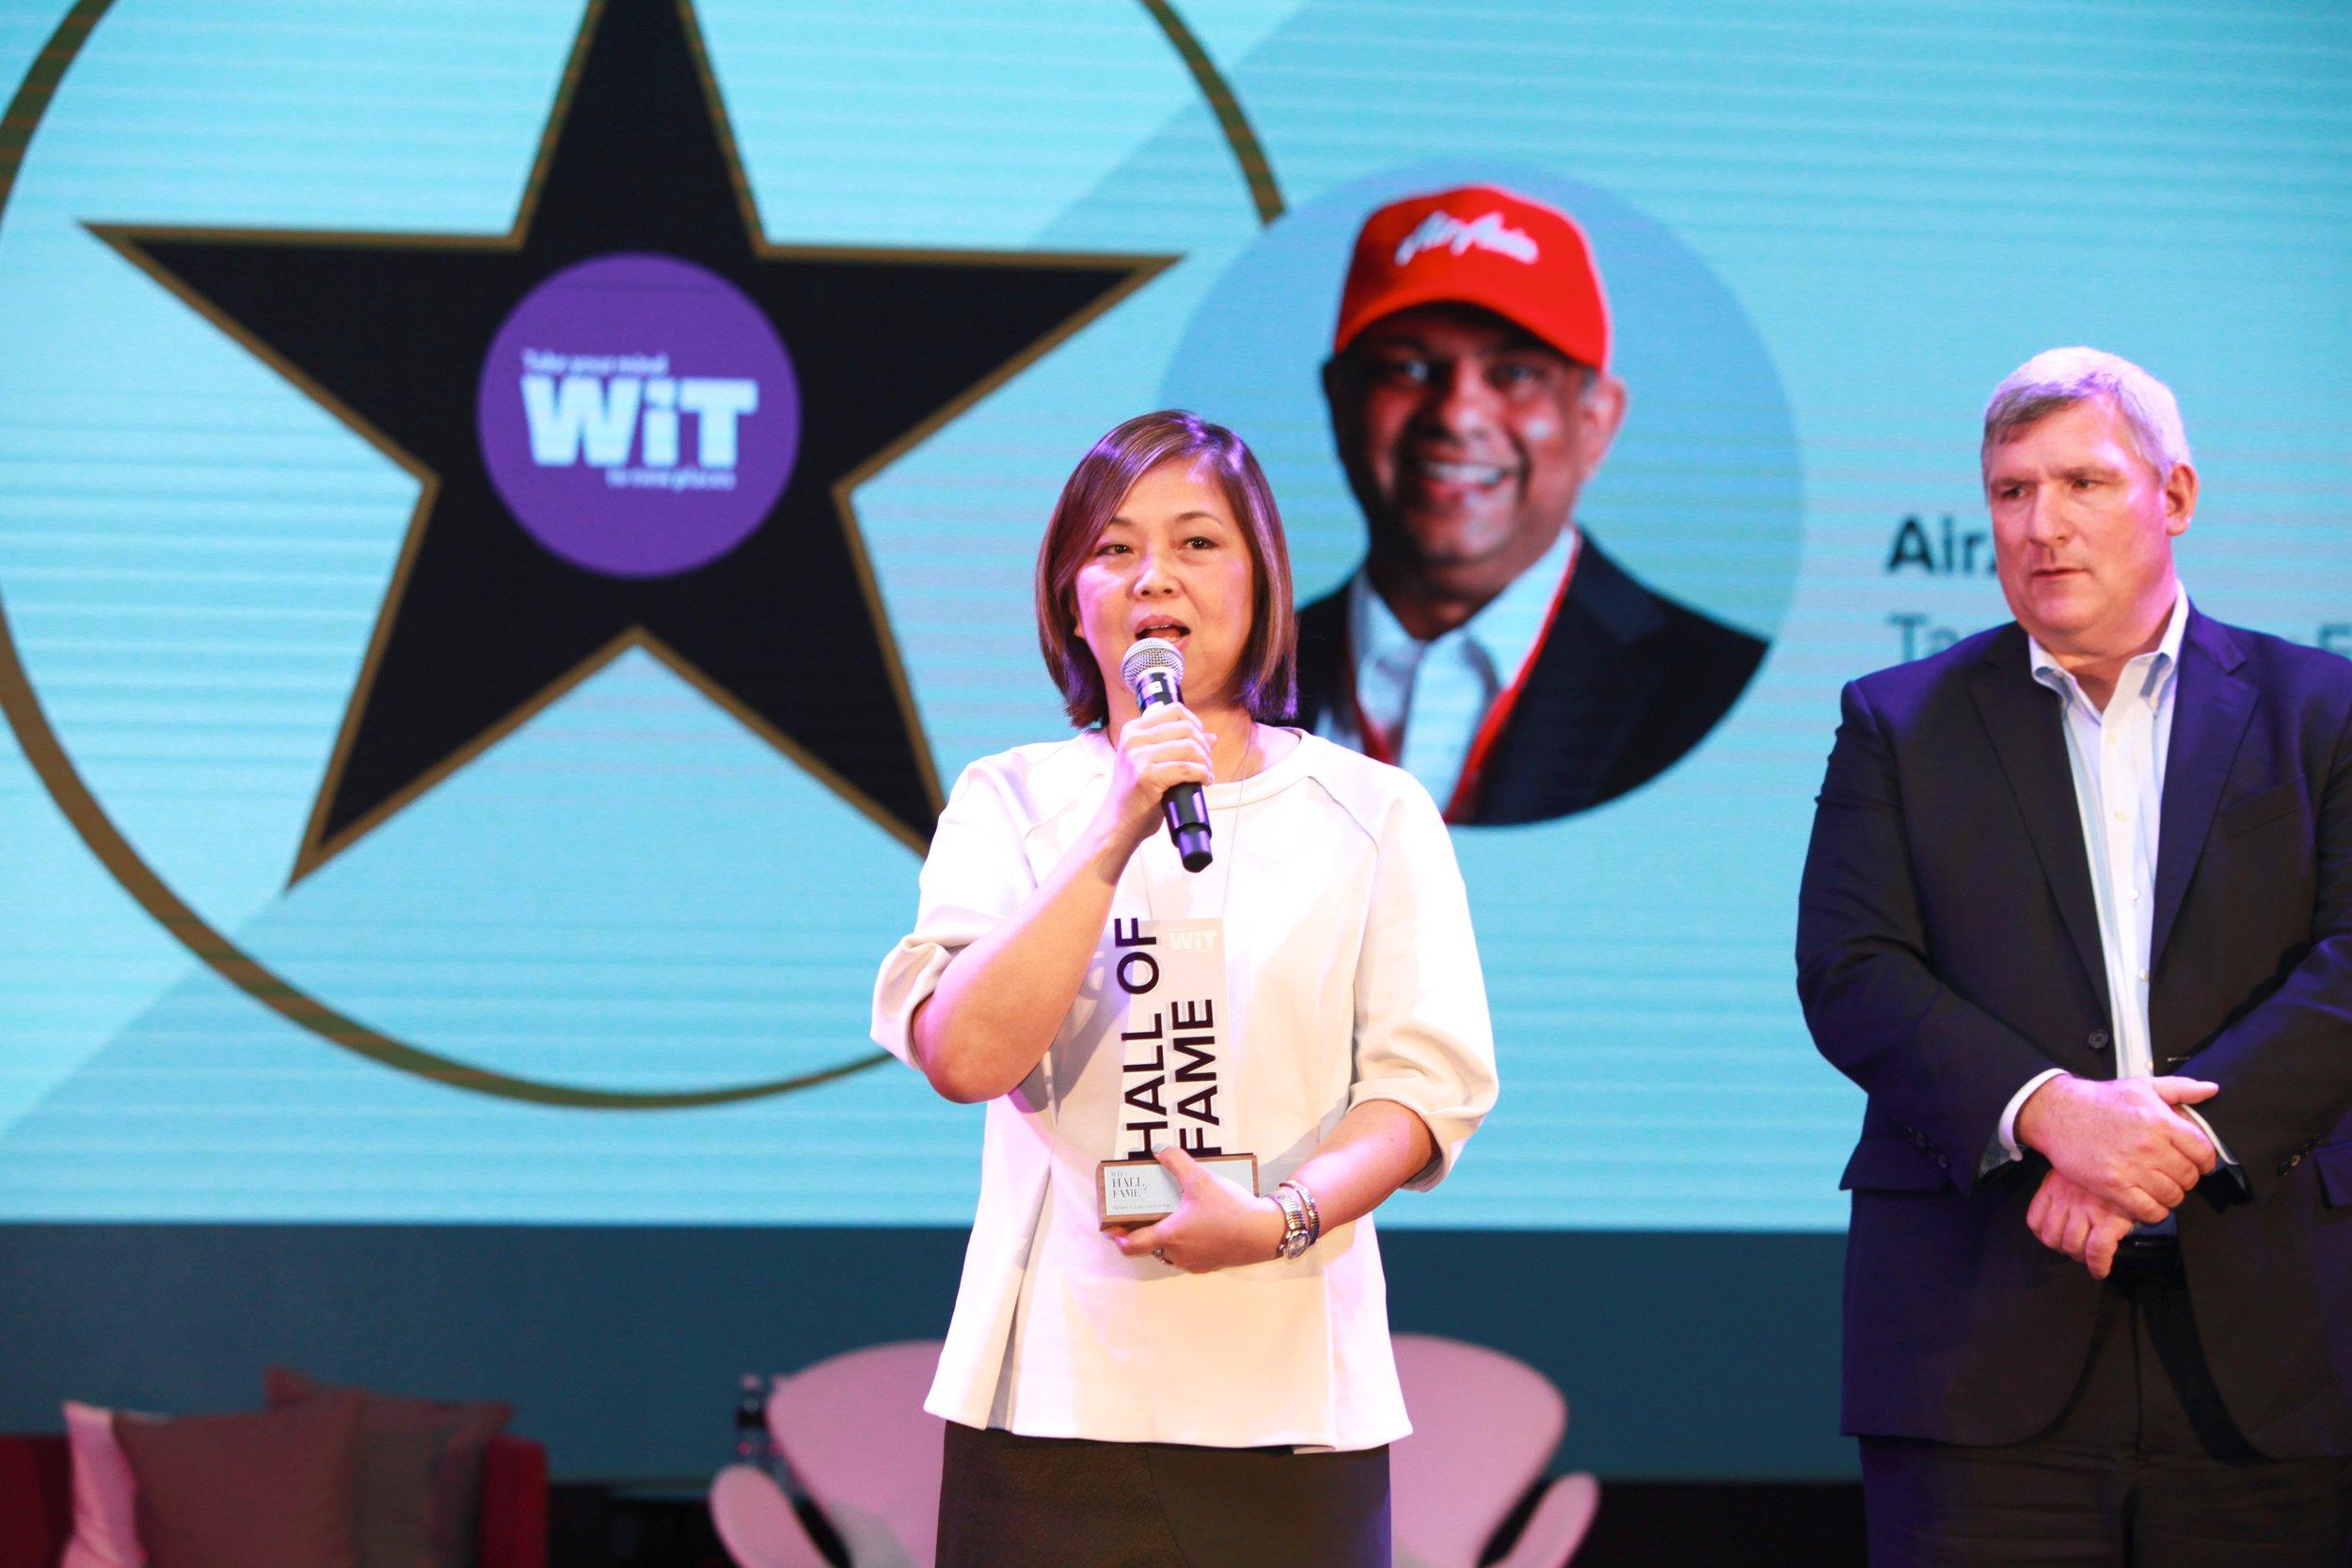 Kathleen Tan, President, China & North Asia, AirAsia accepting the award.